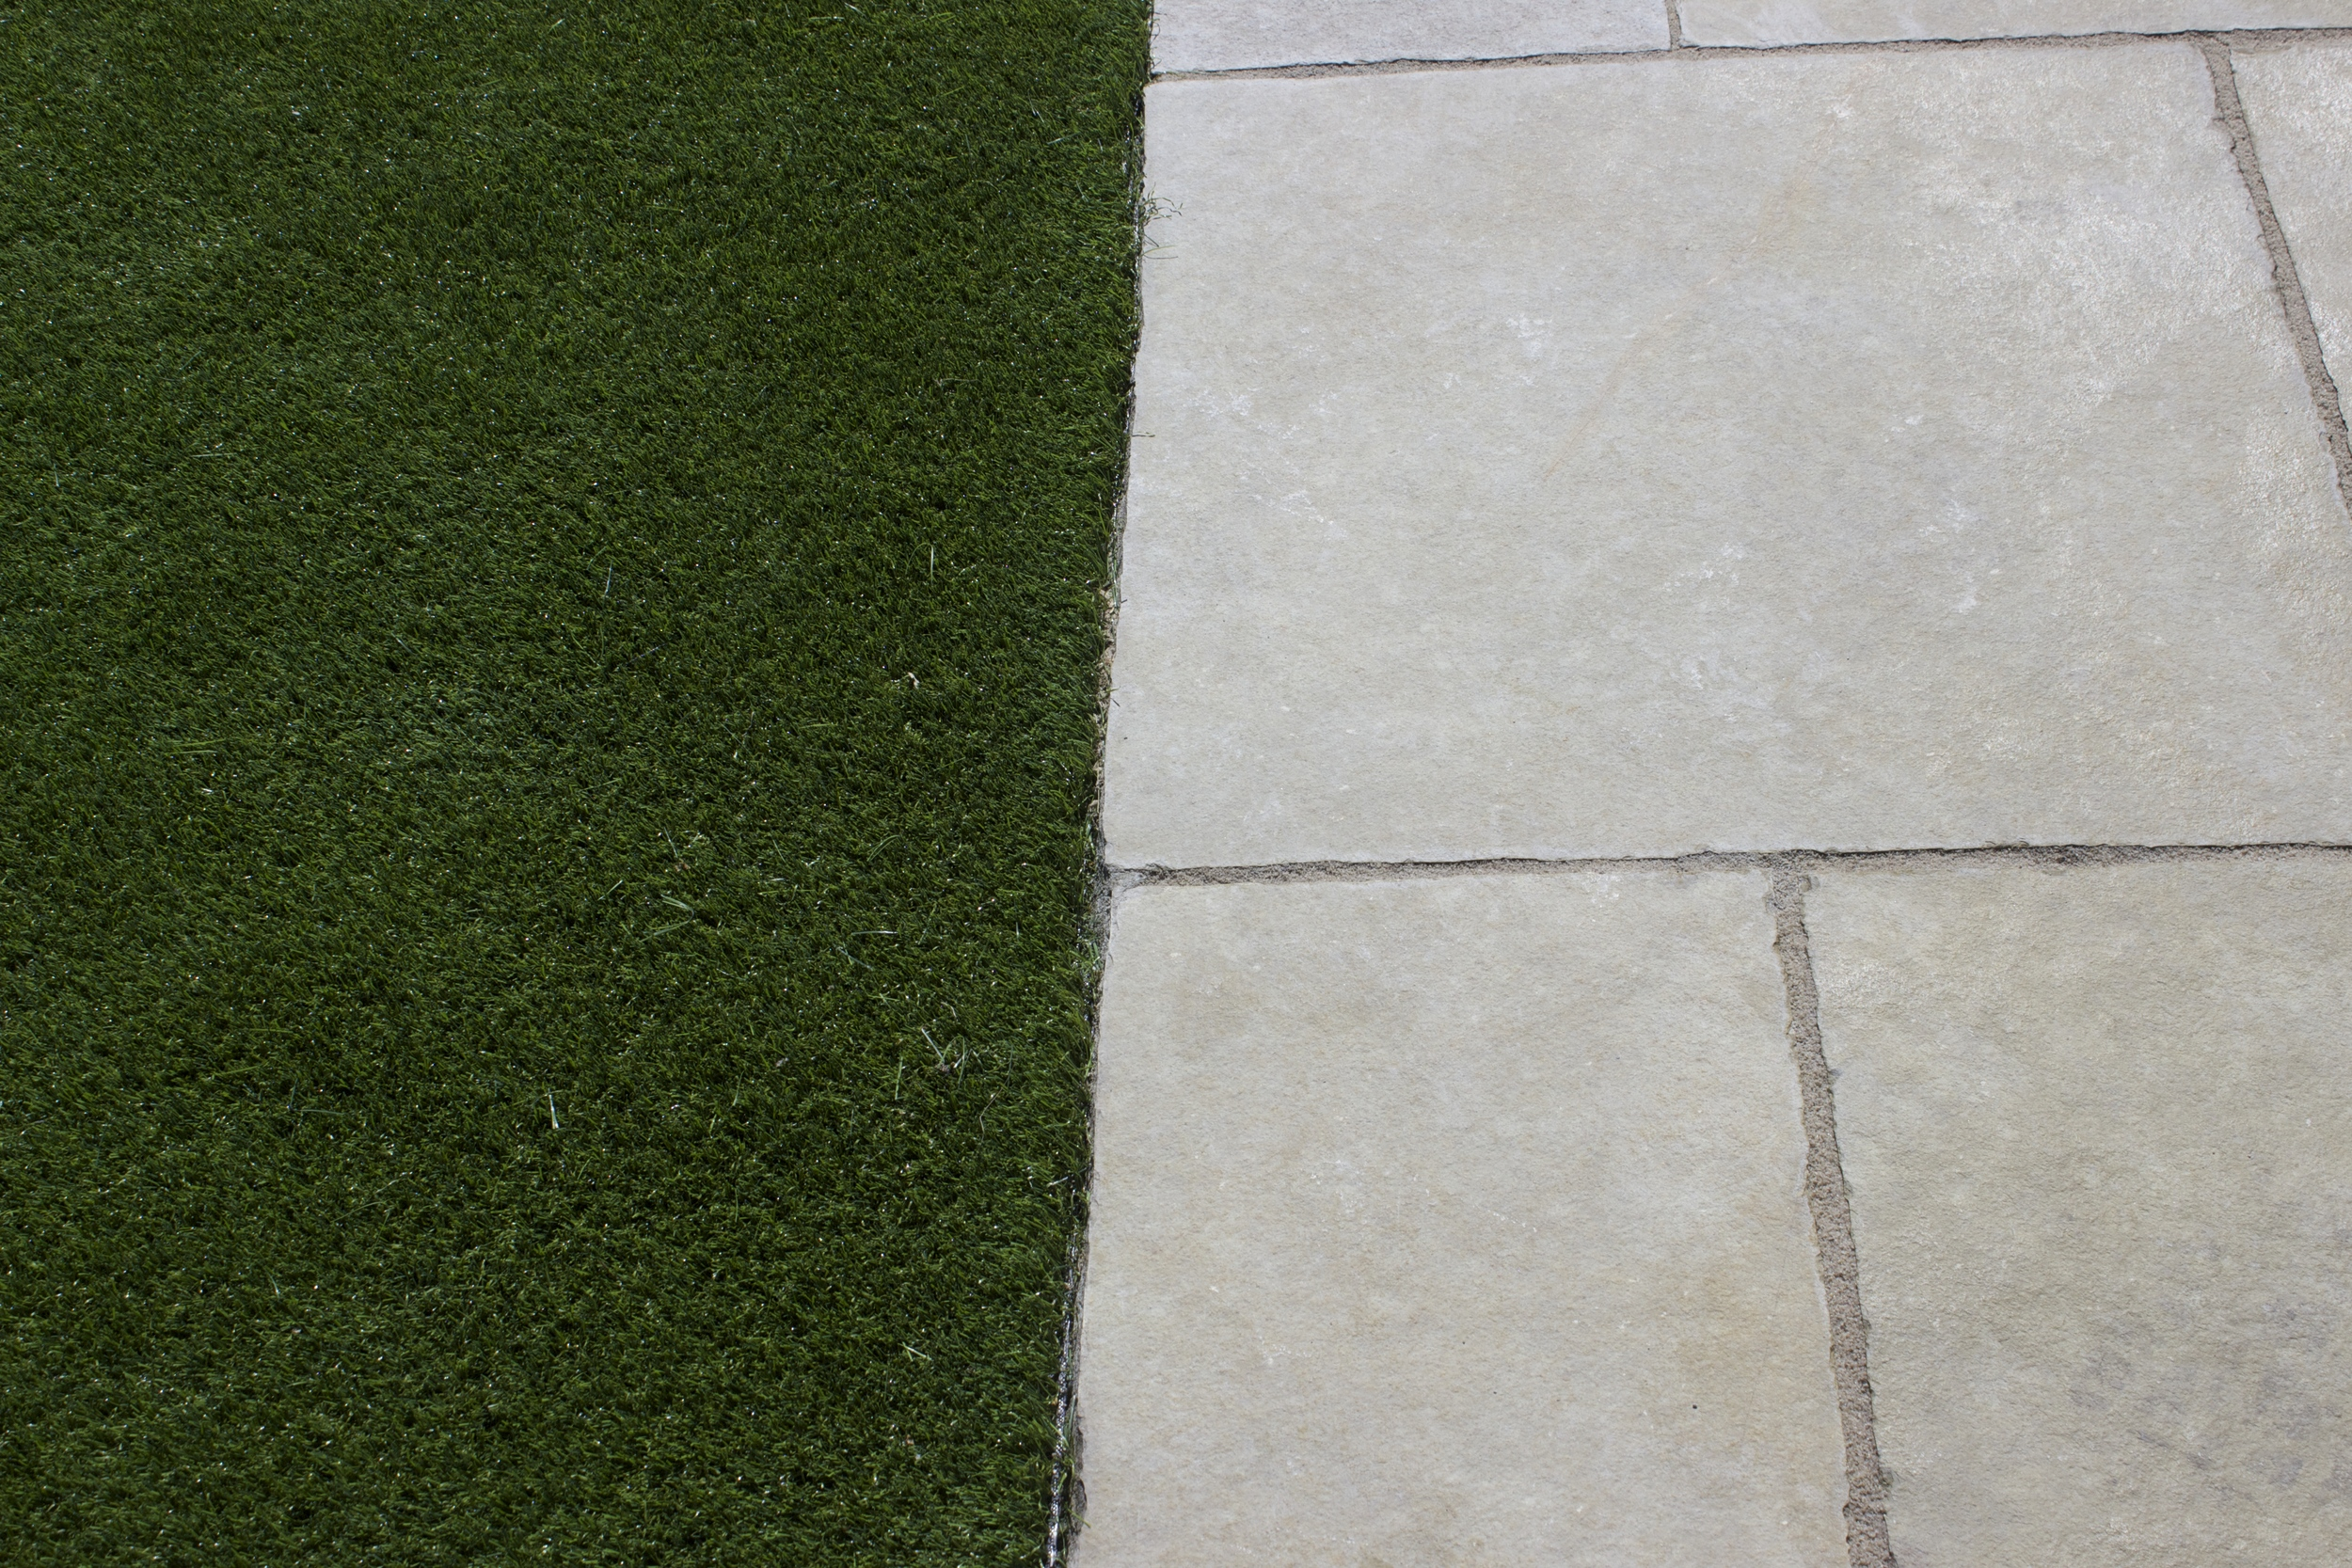 limestone and turf